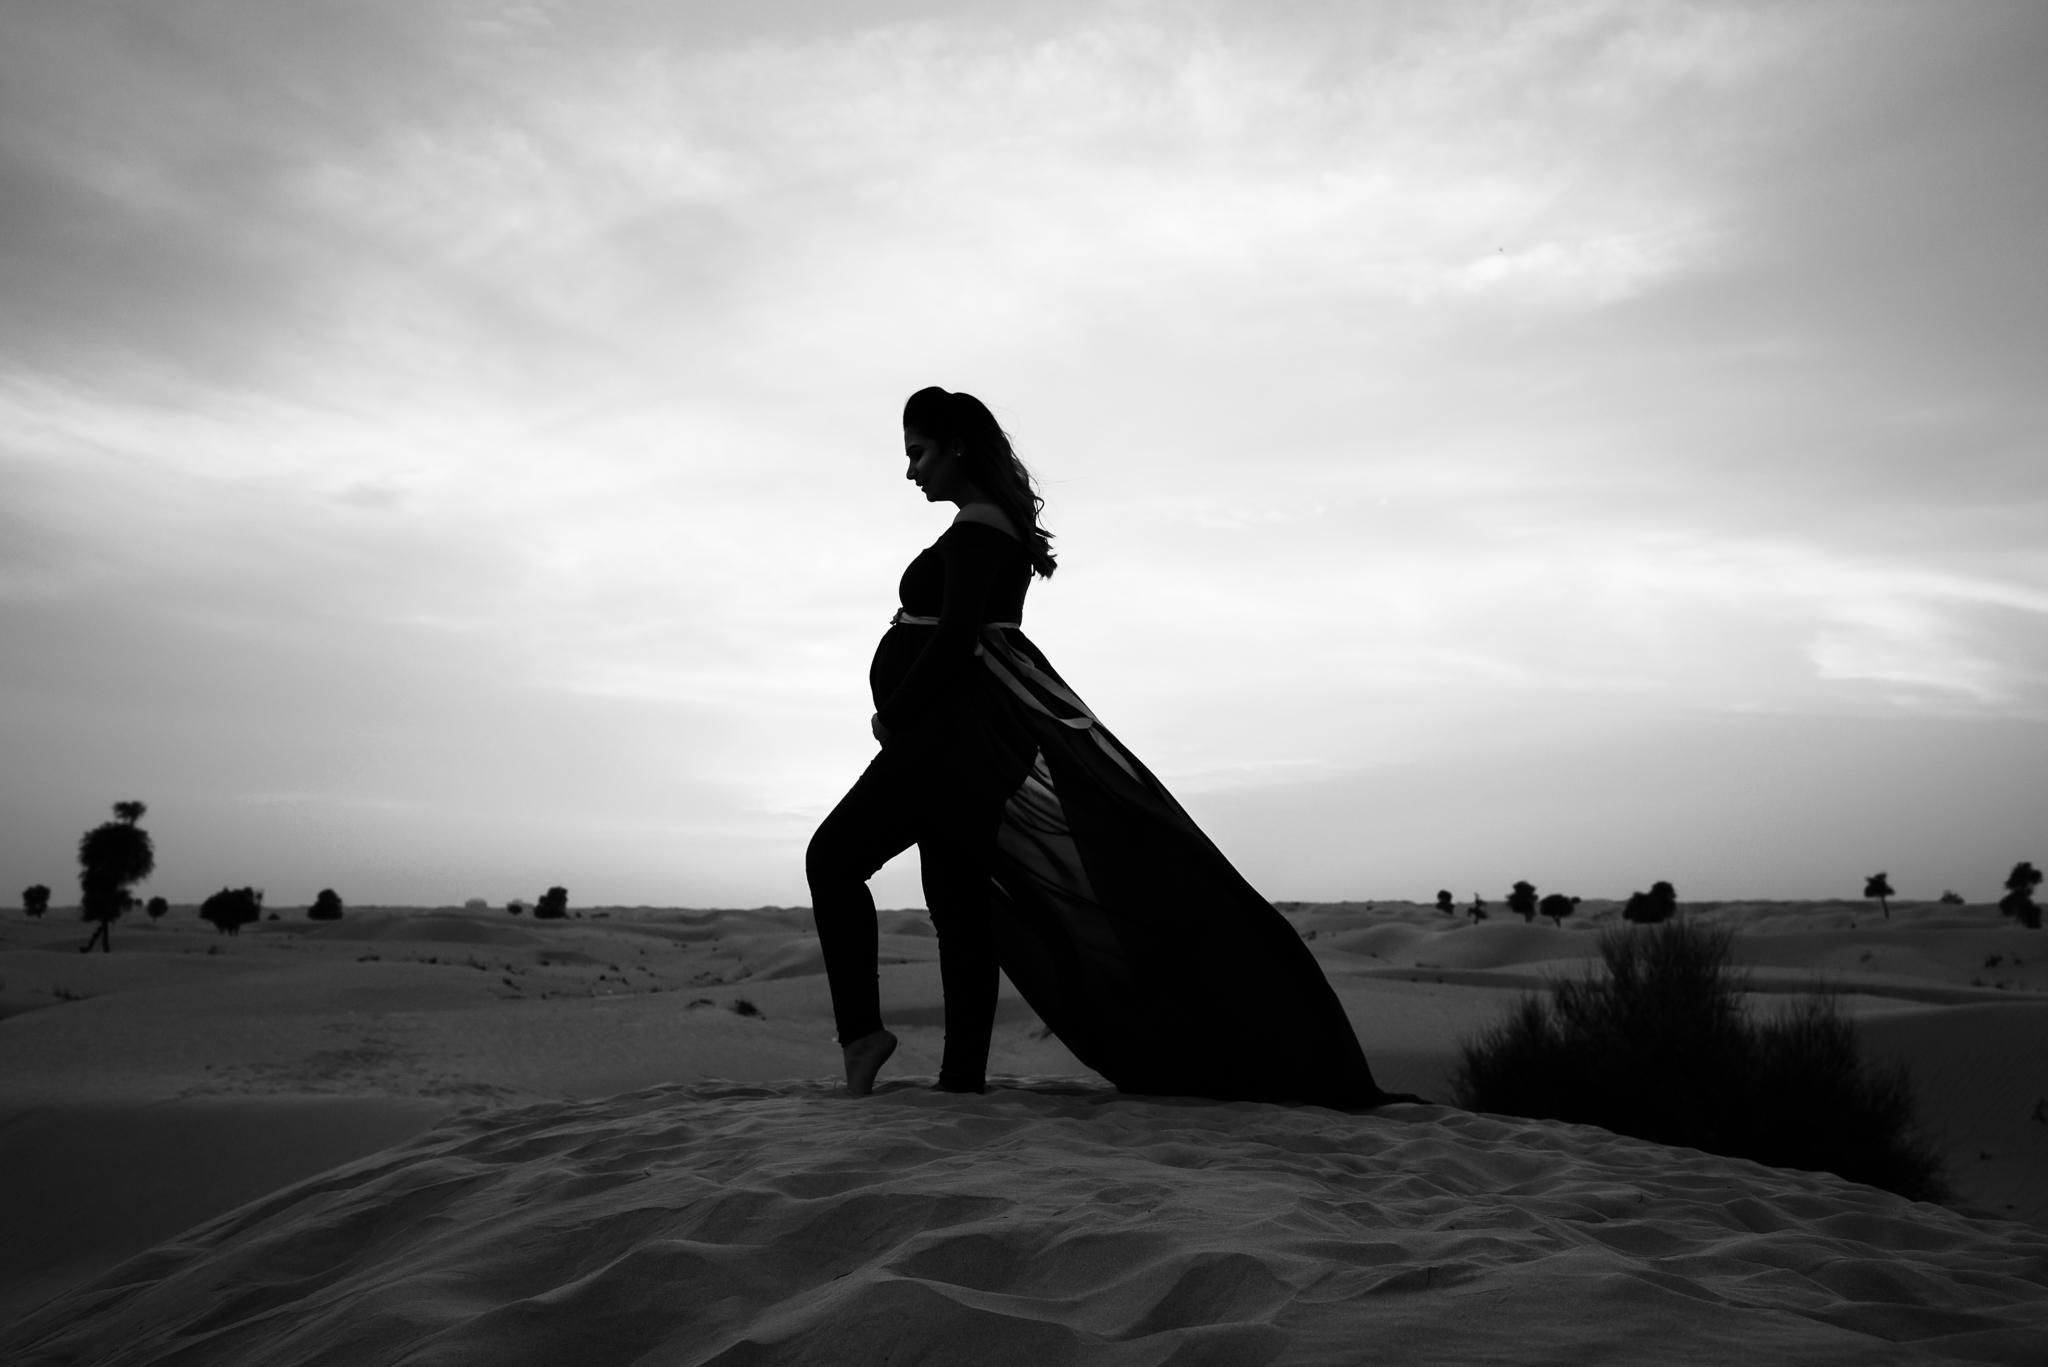 Lana-Photographs-Dubai-Maternity-Photographer-FatimaE-PSLR-60.jpg